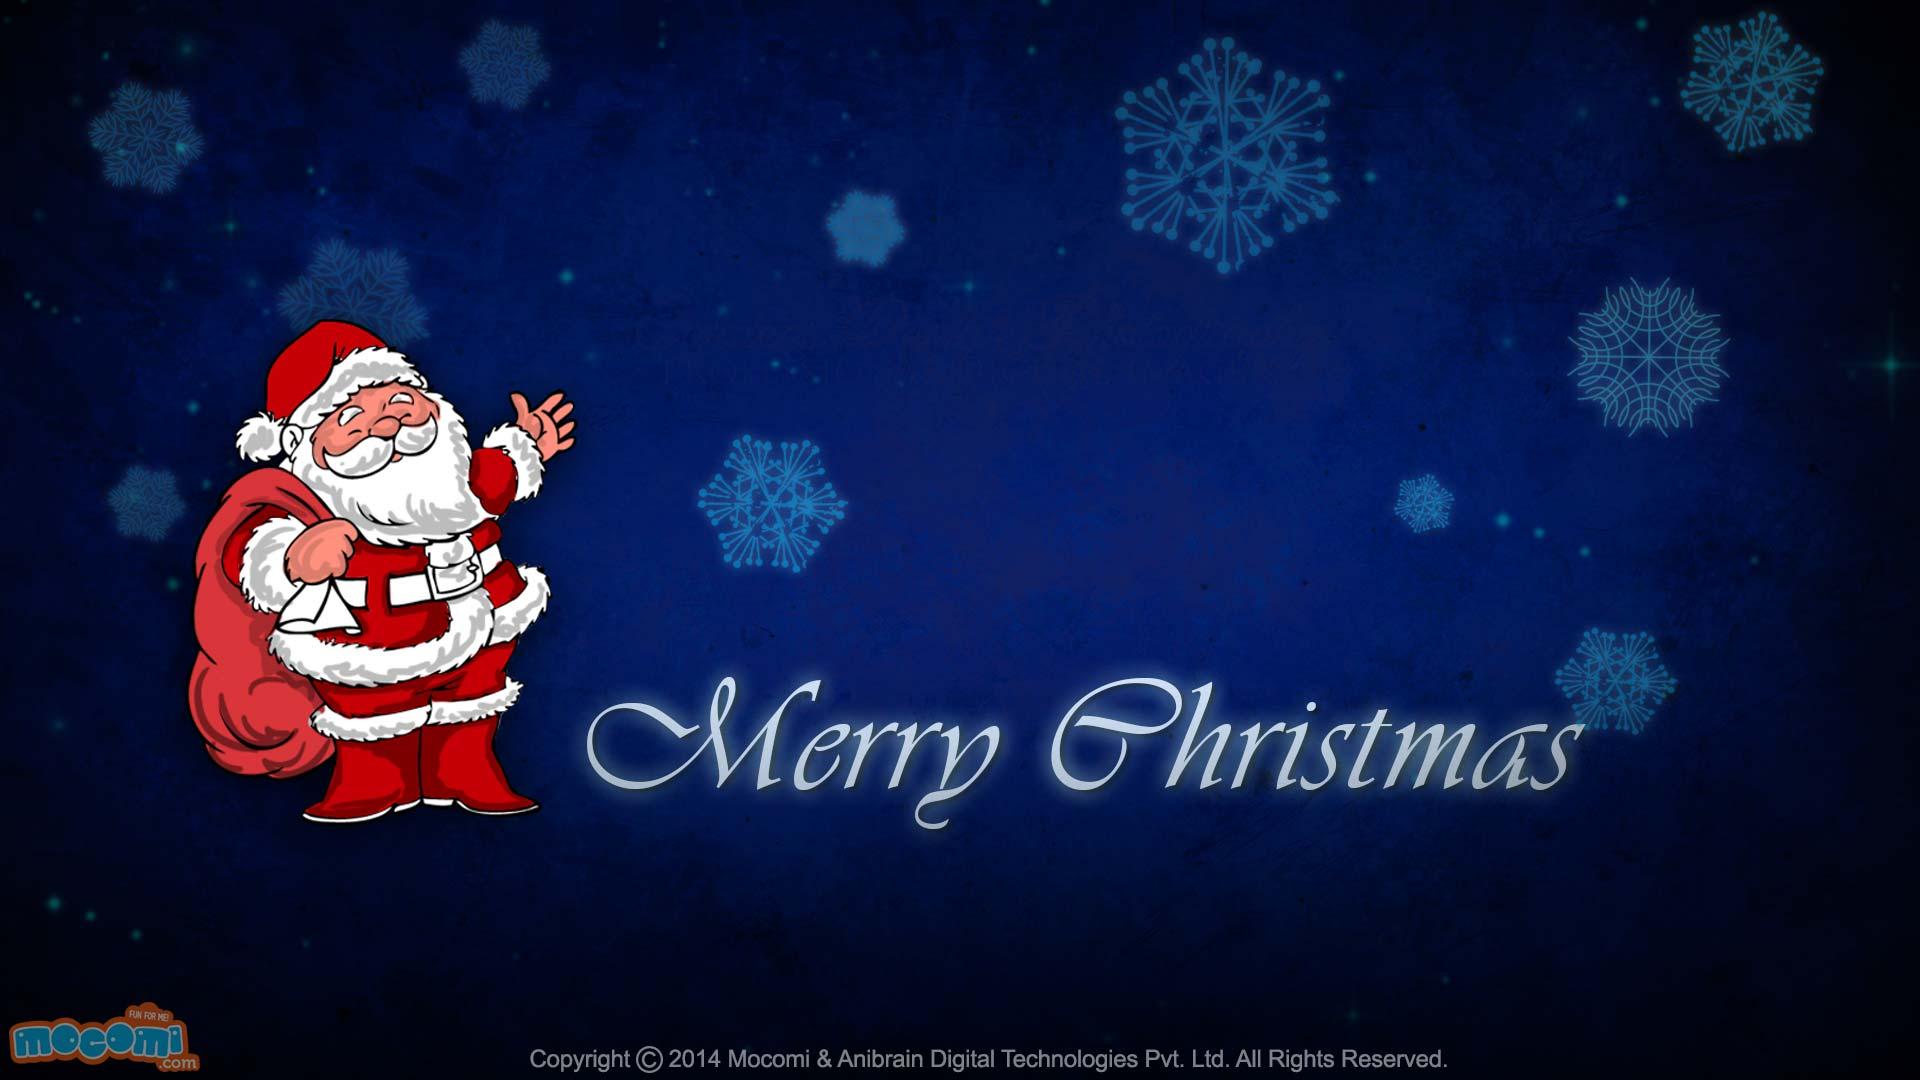 Merry Christmas- Happy Santa